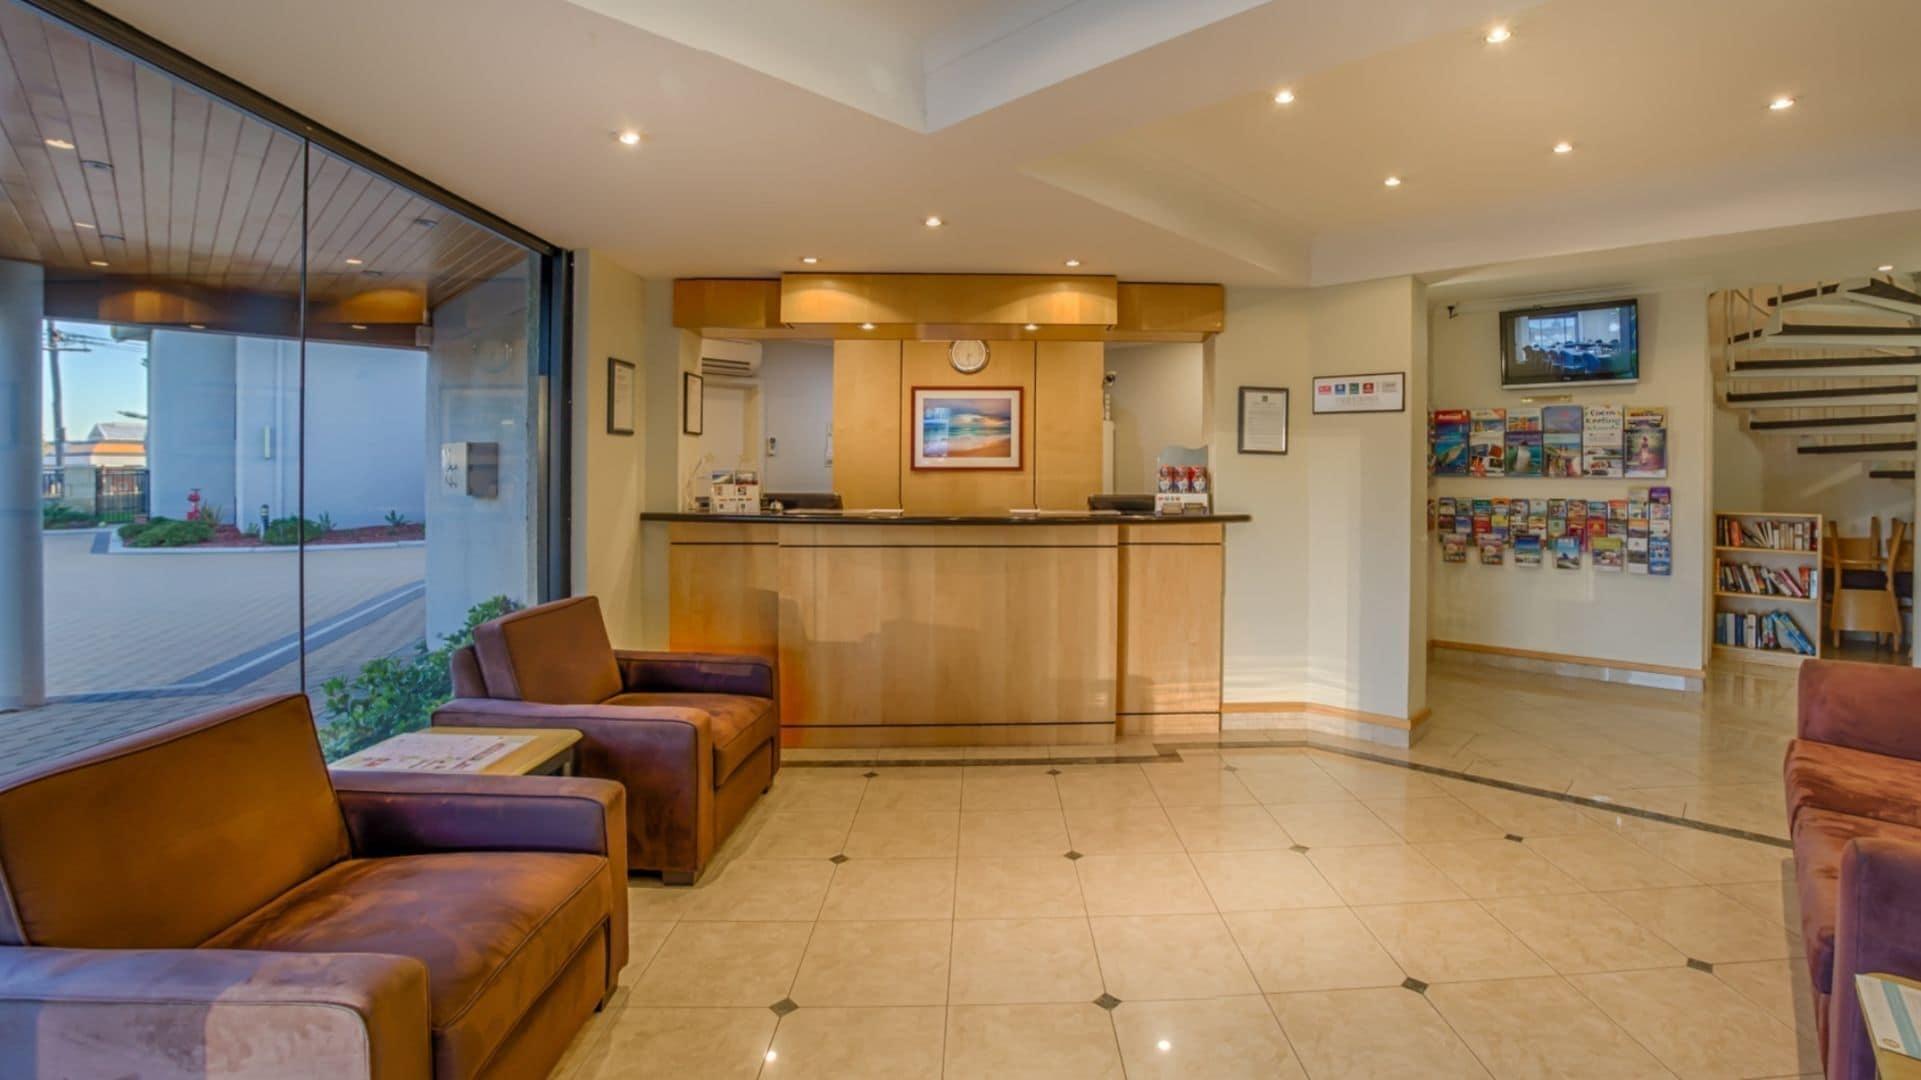 3 Bedroom Apartment @ Quality Resort Sorrento Beach